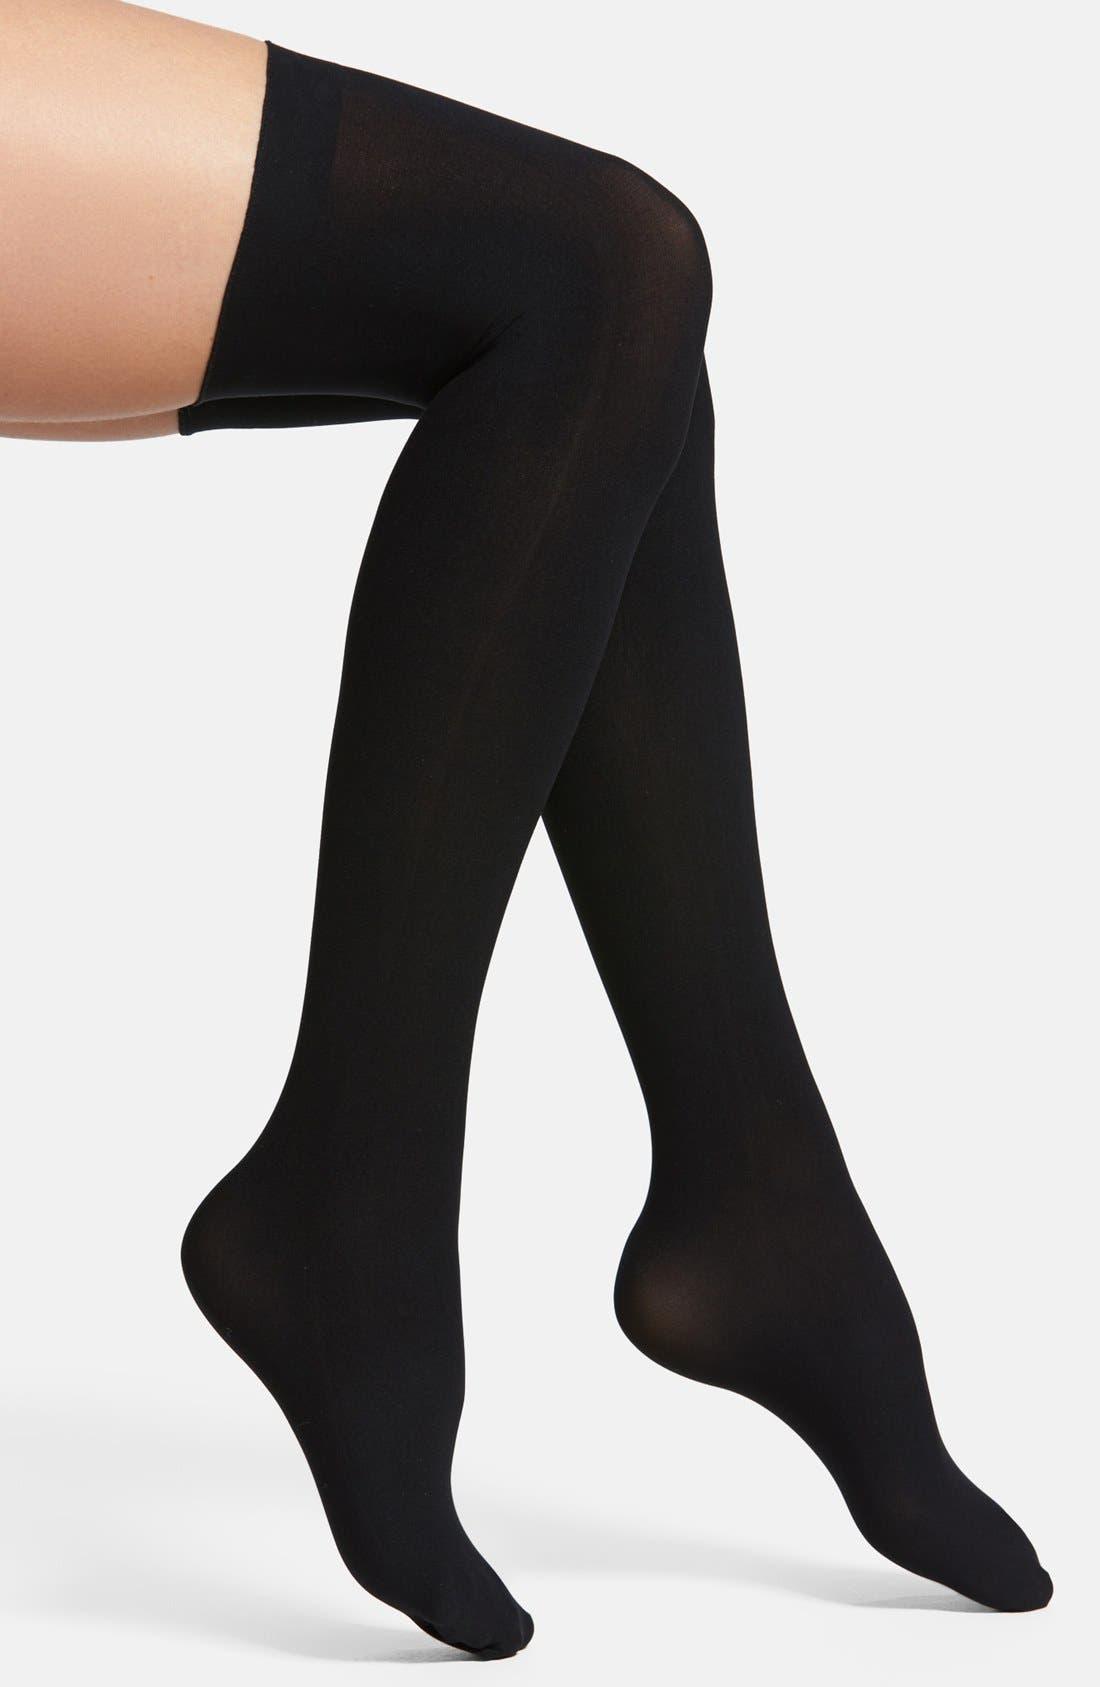 COMMANDO, Up All Night Thigh High Socks, Main thumbnail 1, color, BLACK